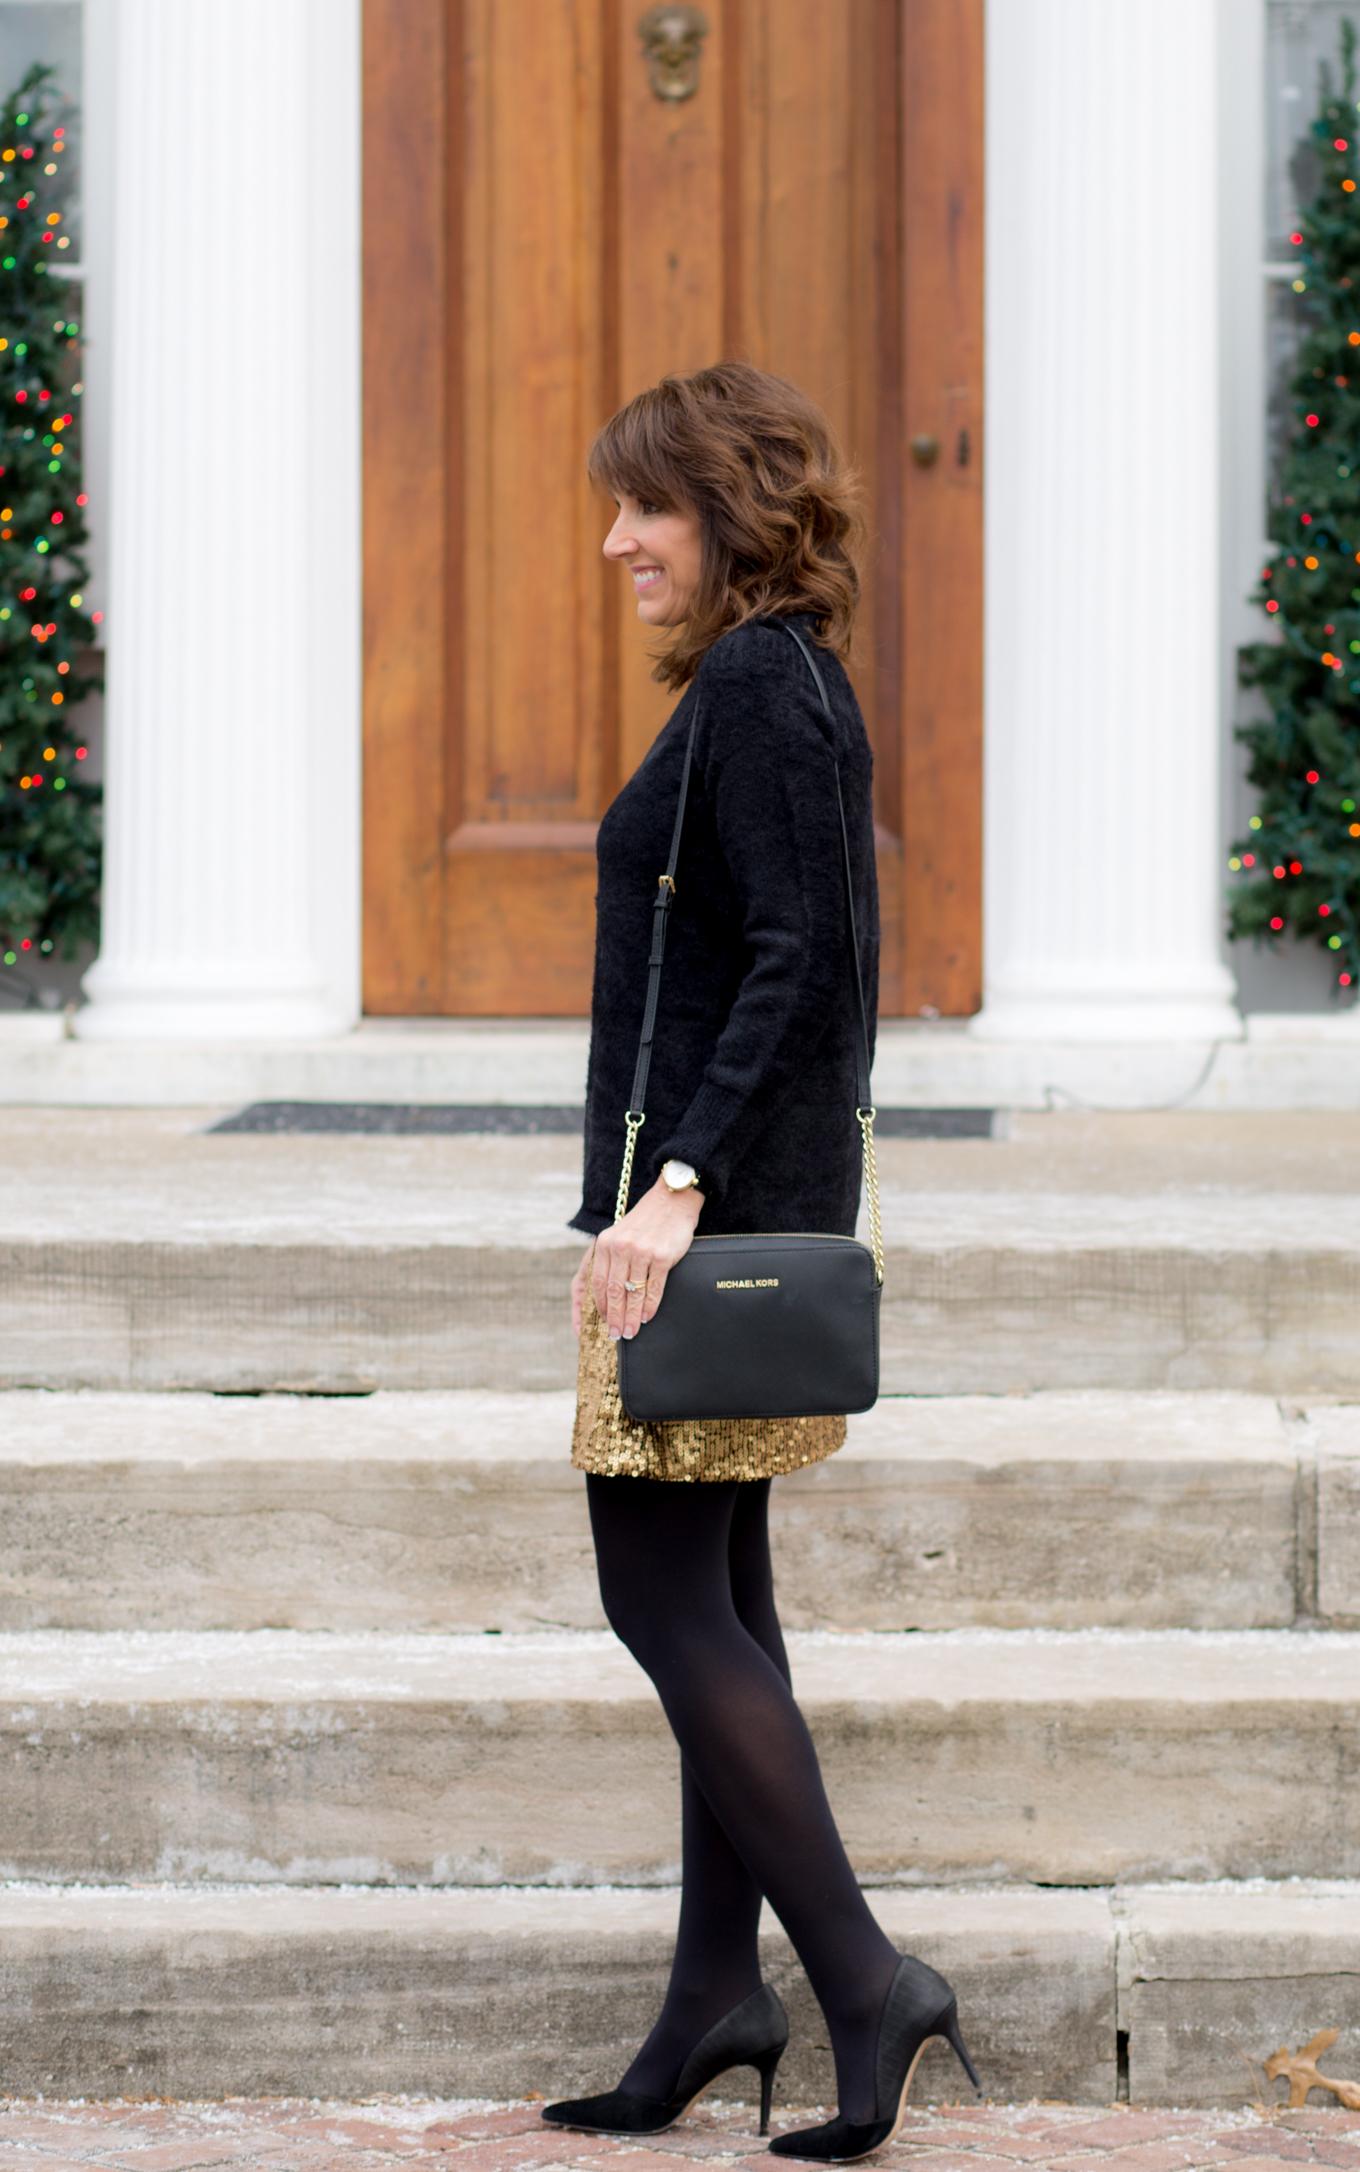 25 Days of Winter Fashion: Gold Sequin Skirt under $50